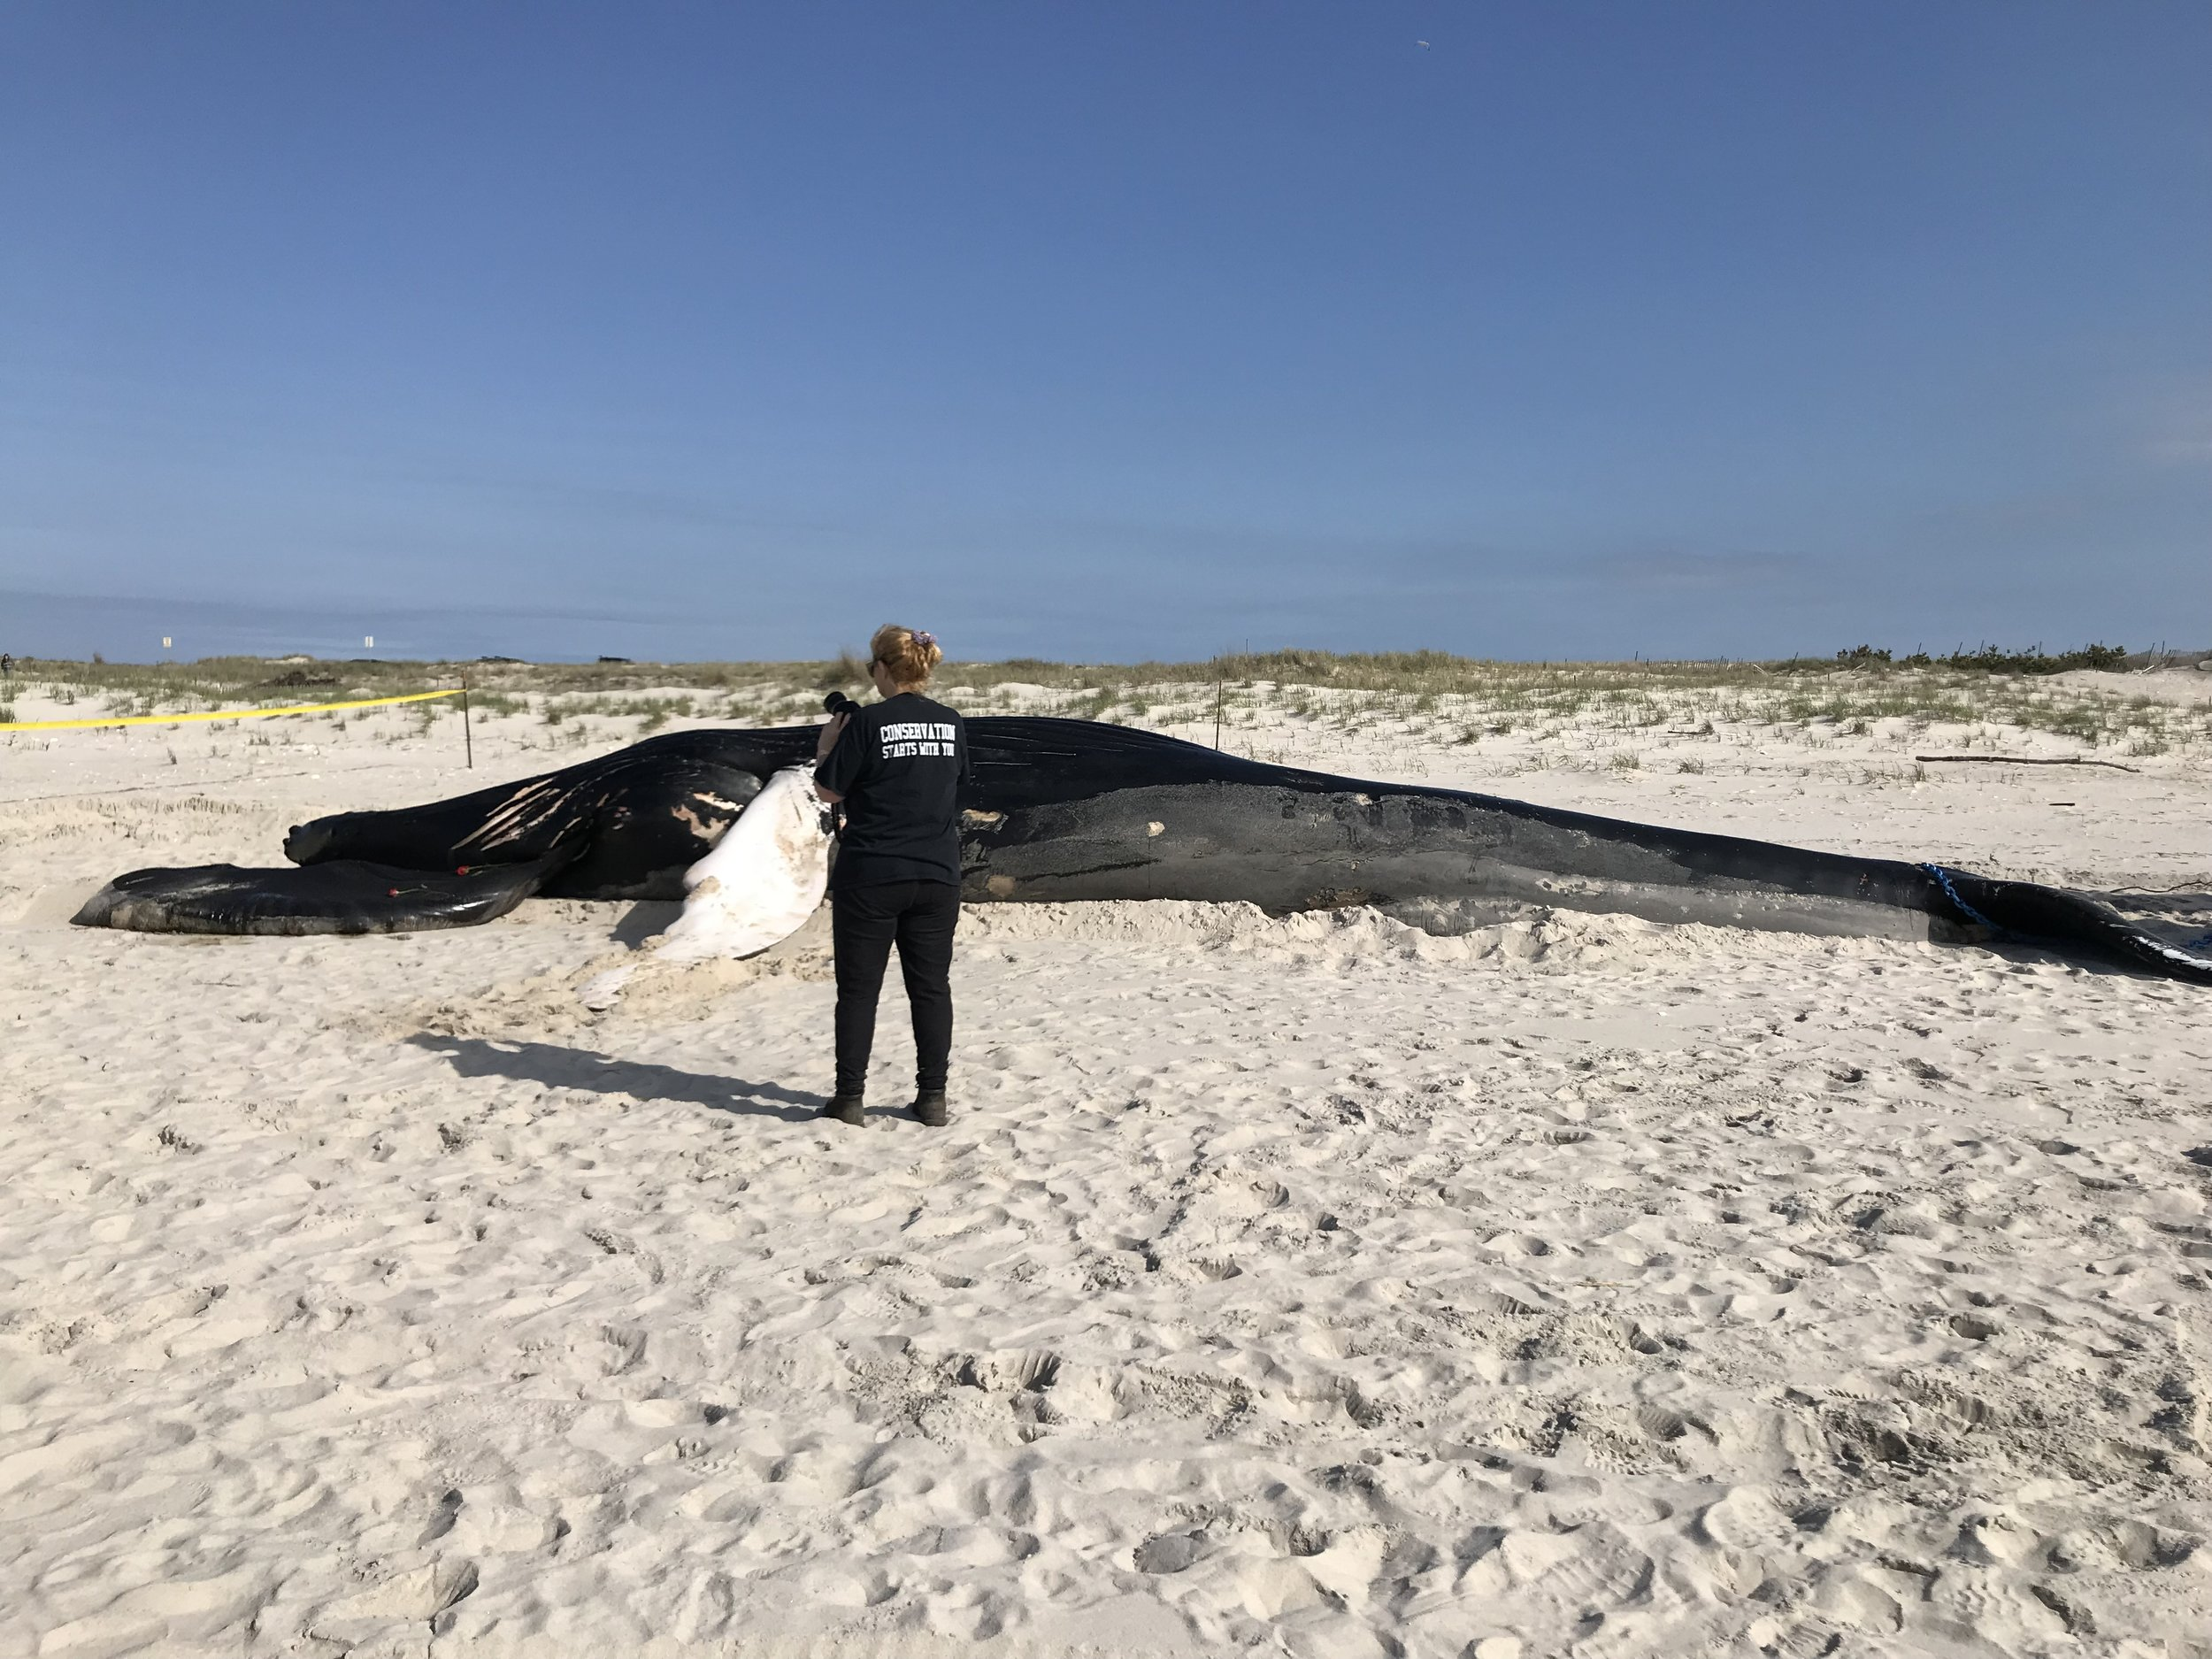 Atlantic Marine Conservation Society humpback whale Westhampton 050519.jpeg